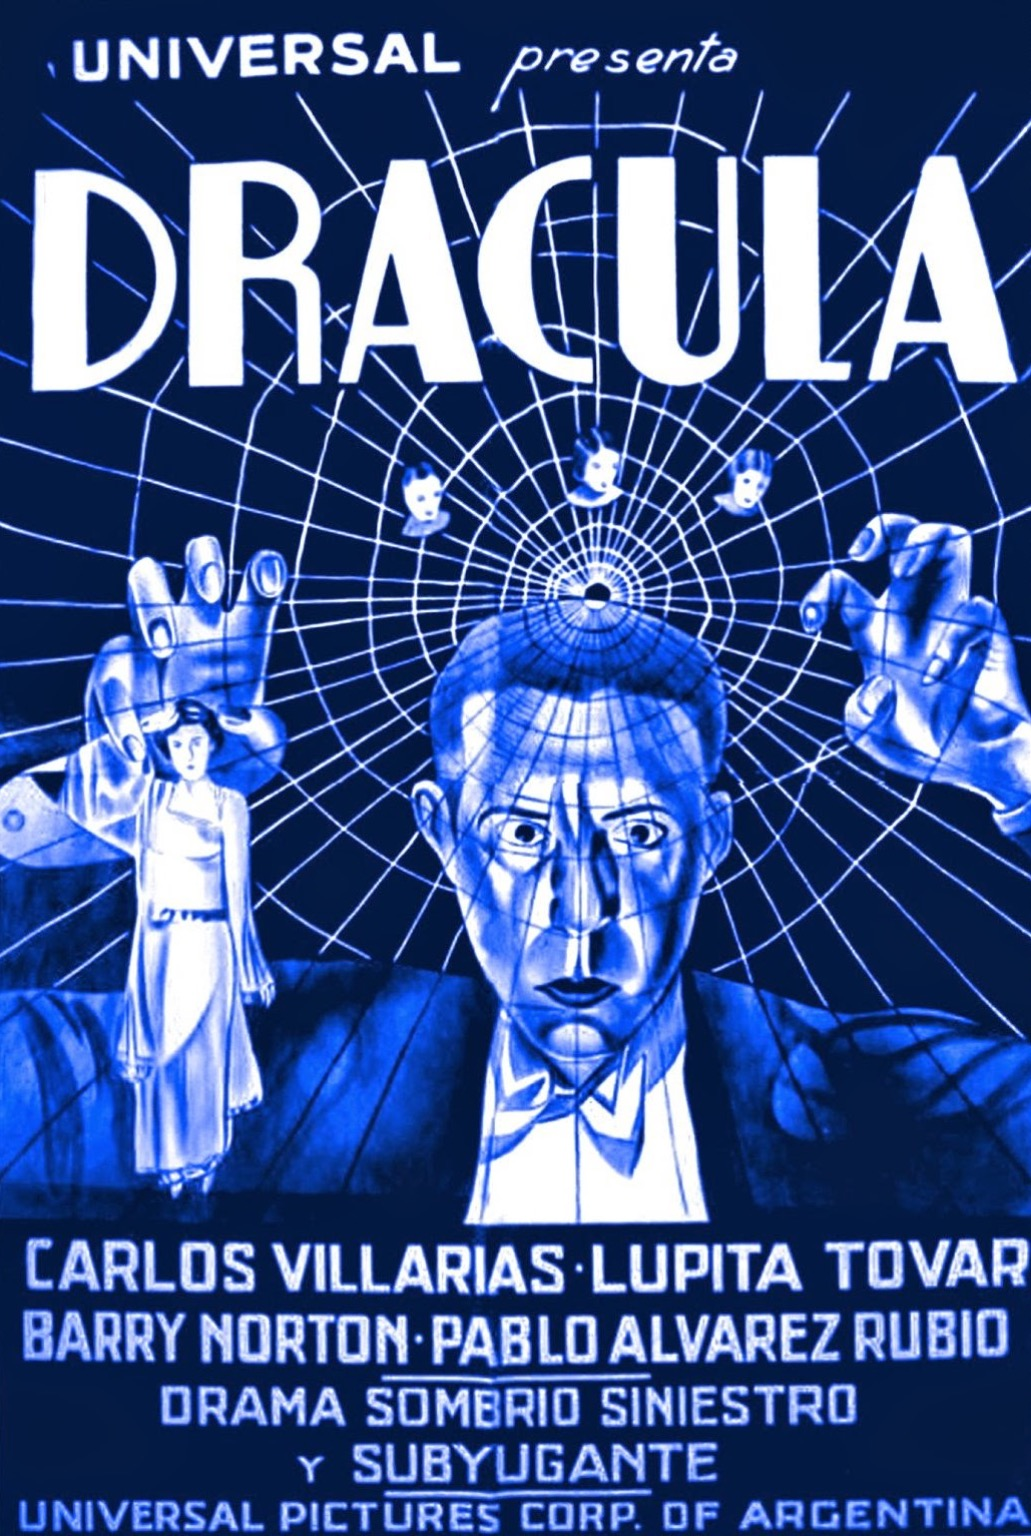 Drácula (1931 Spanish version)